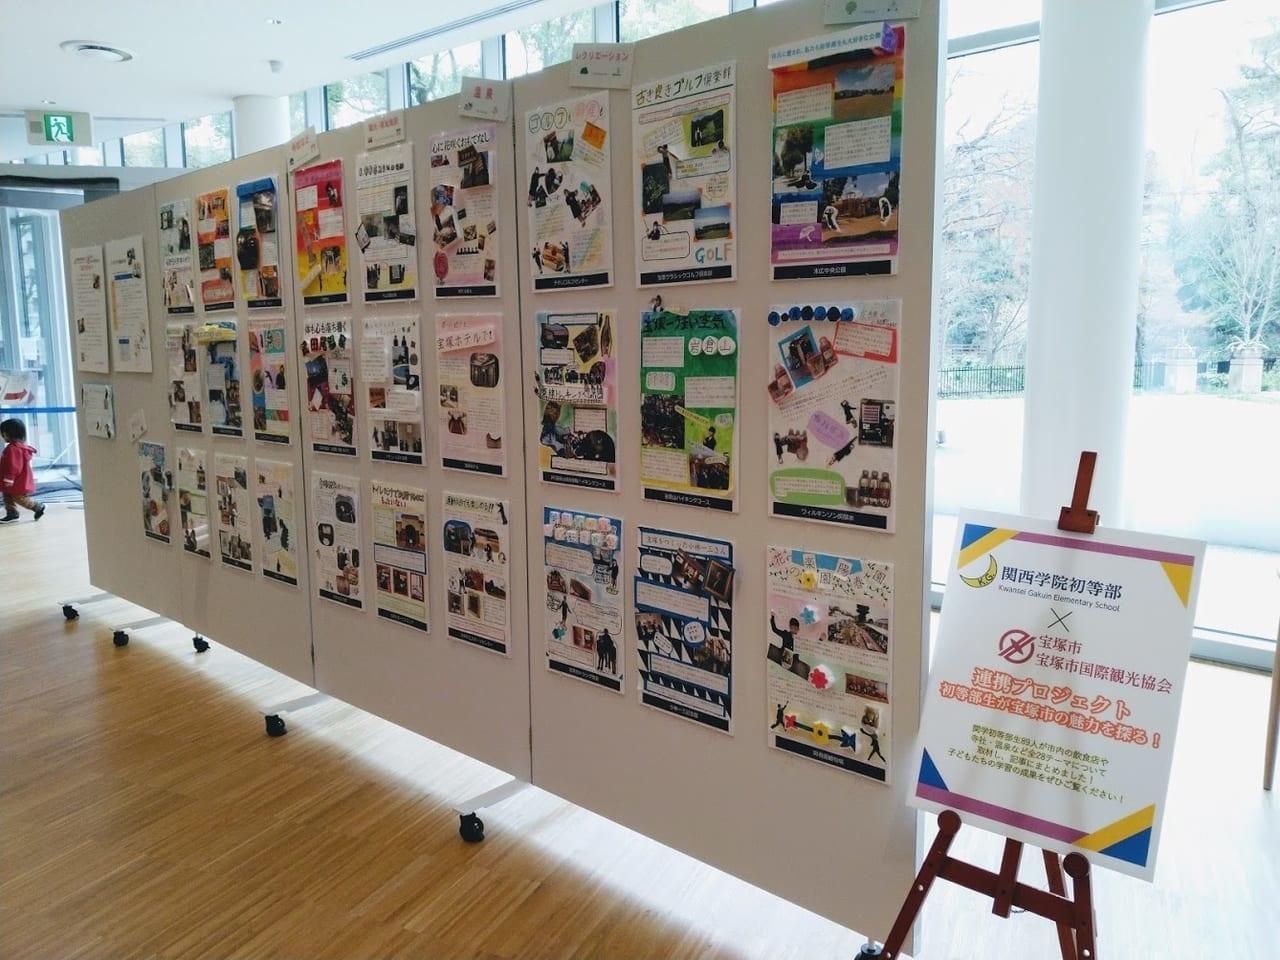 関学初等部×宝塚市×国際観光協会連携プロジェクト